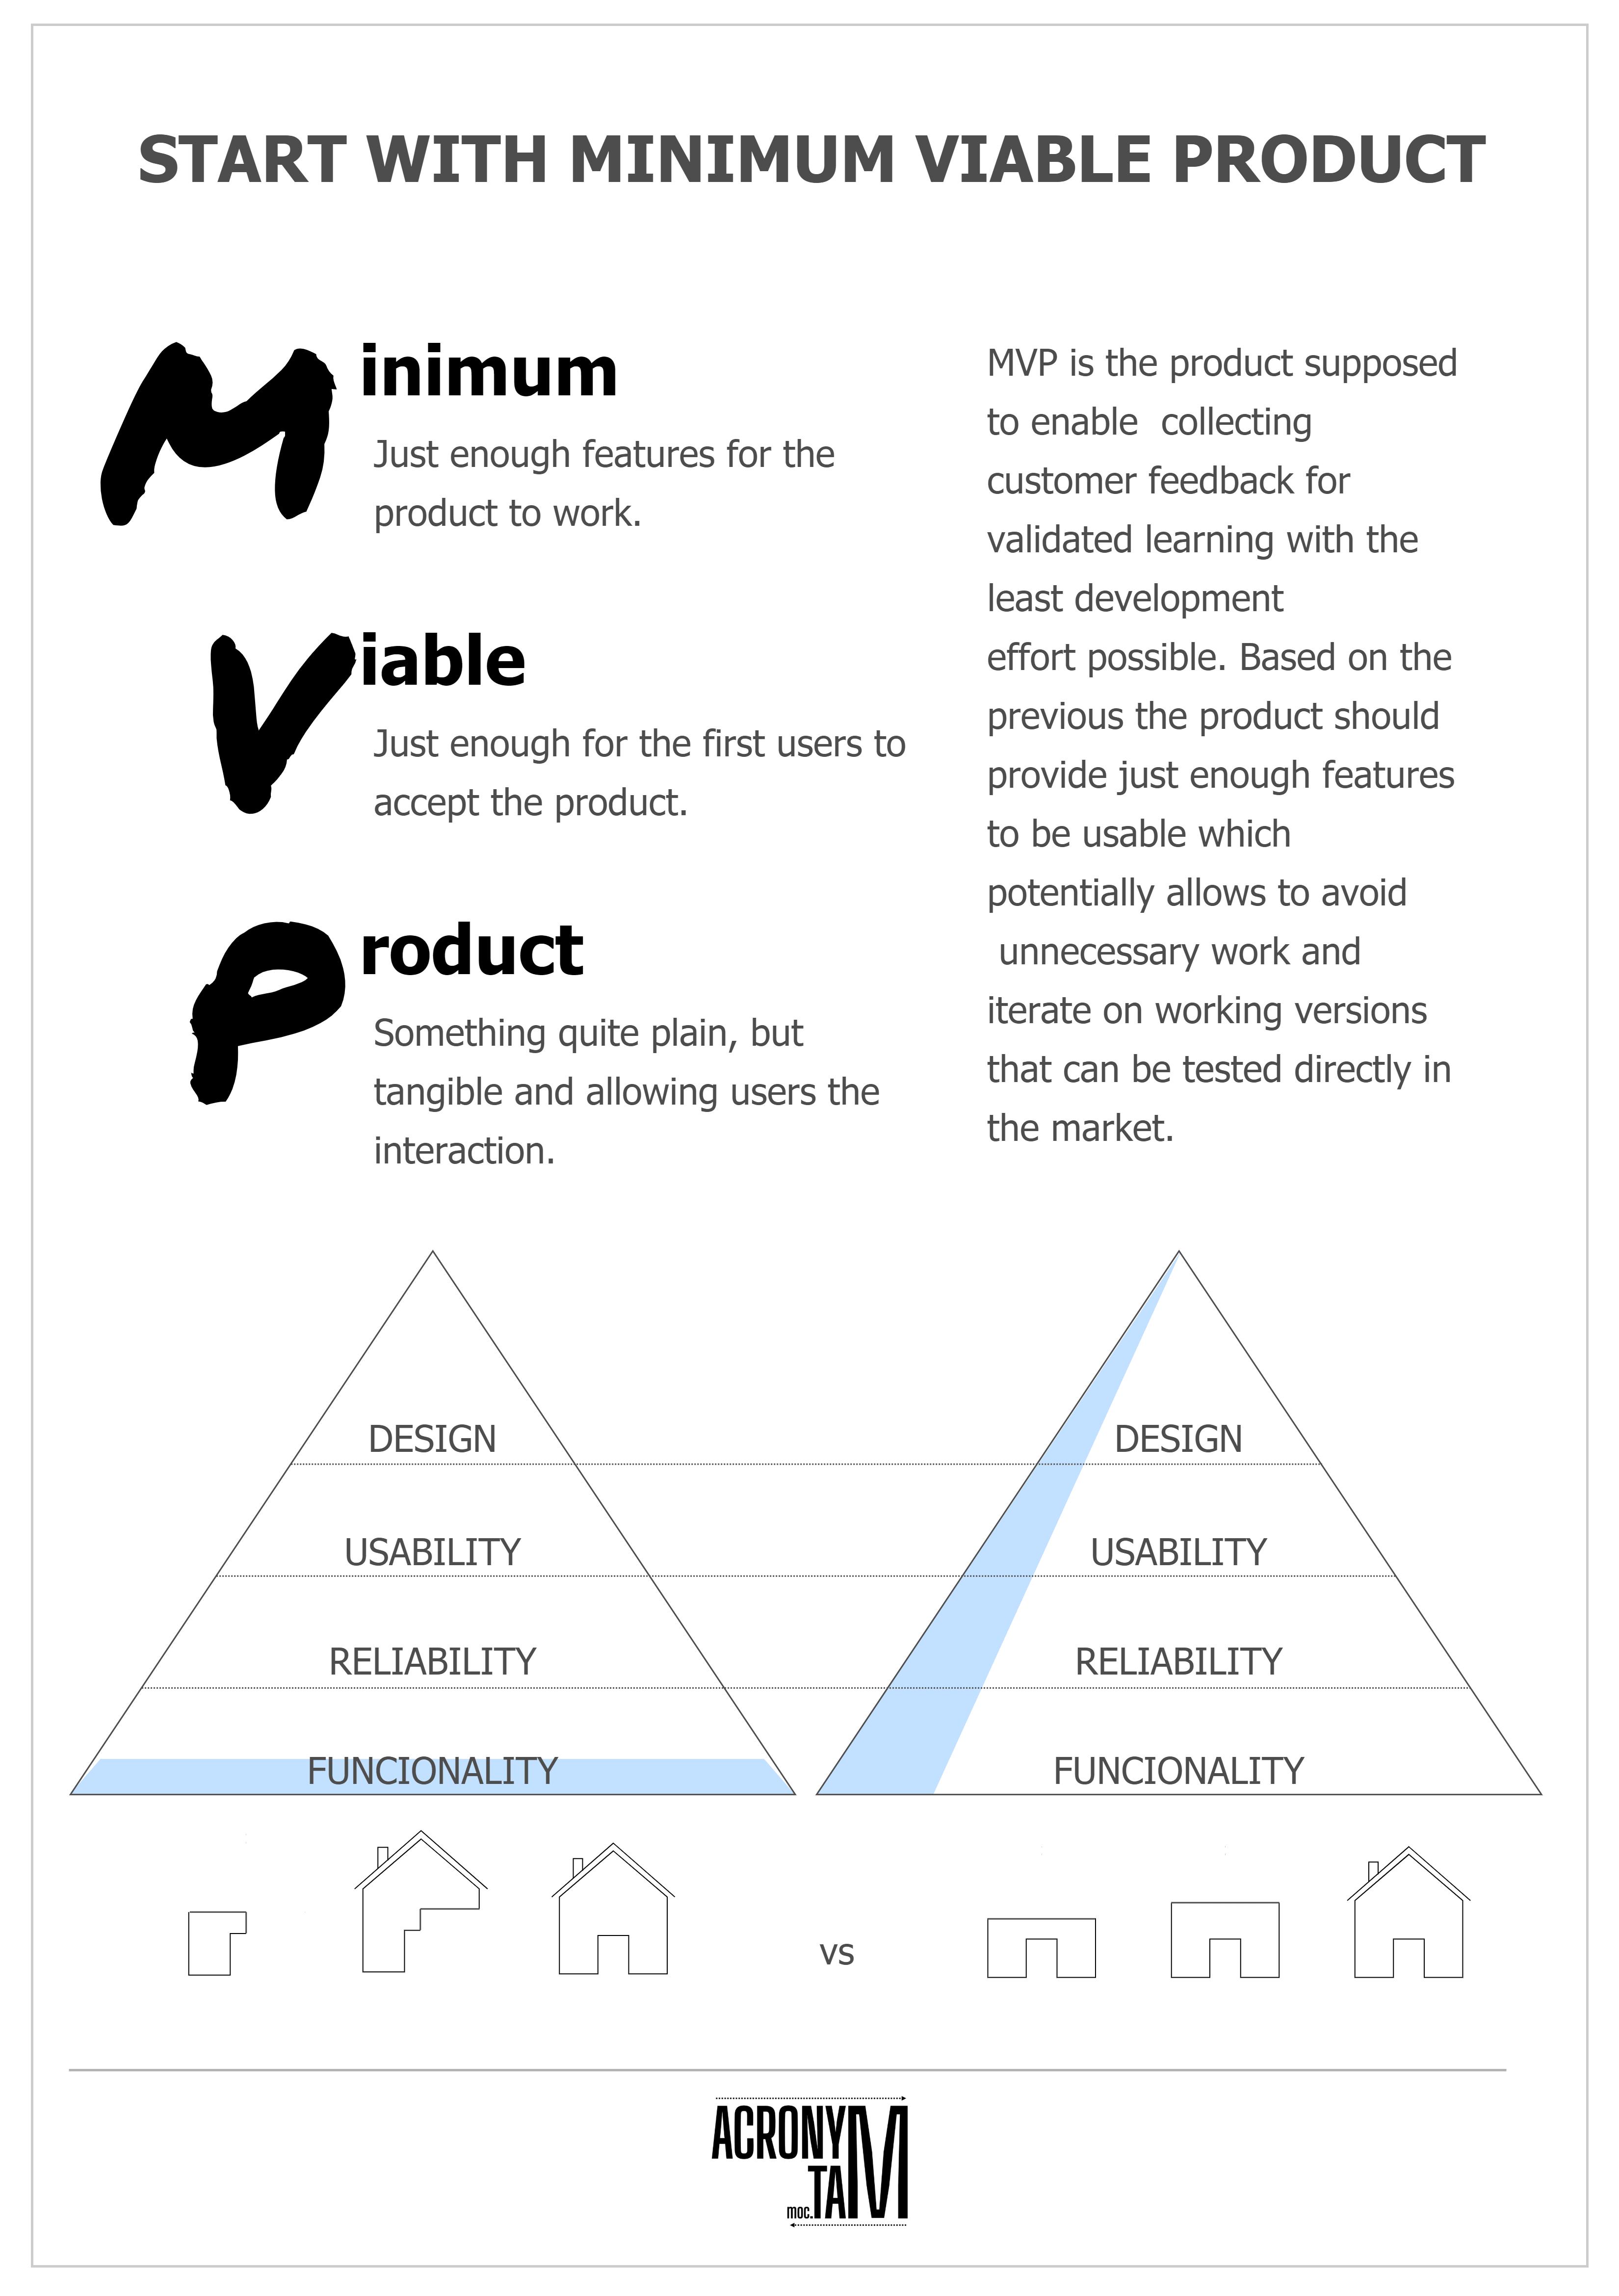 MVP. Minimum Viable Product.